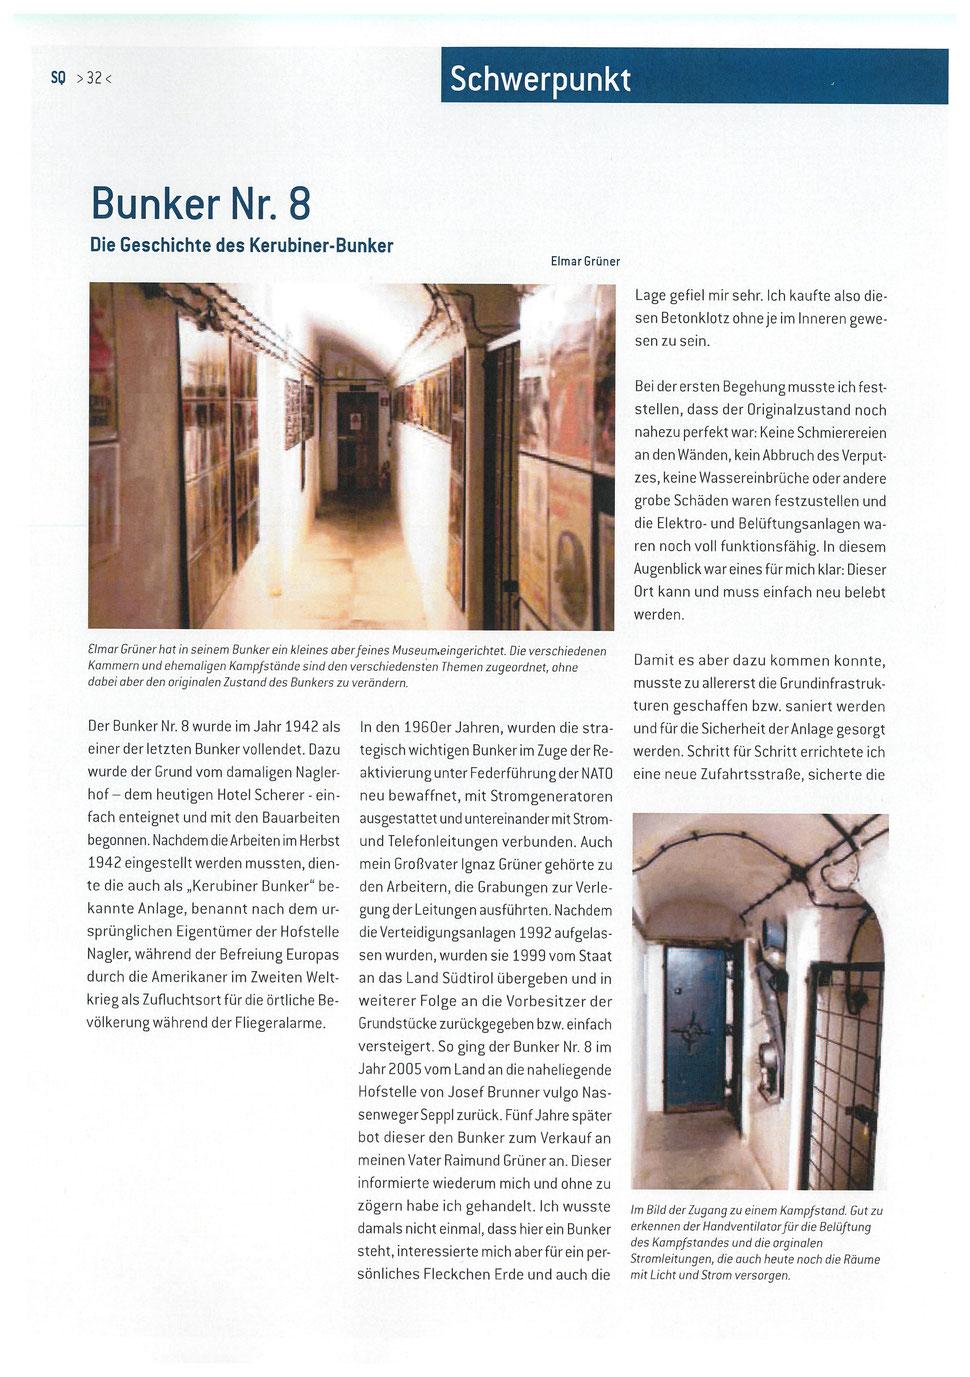 Schwerpunkt Bunker - articolo principale - main article